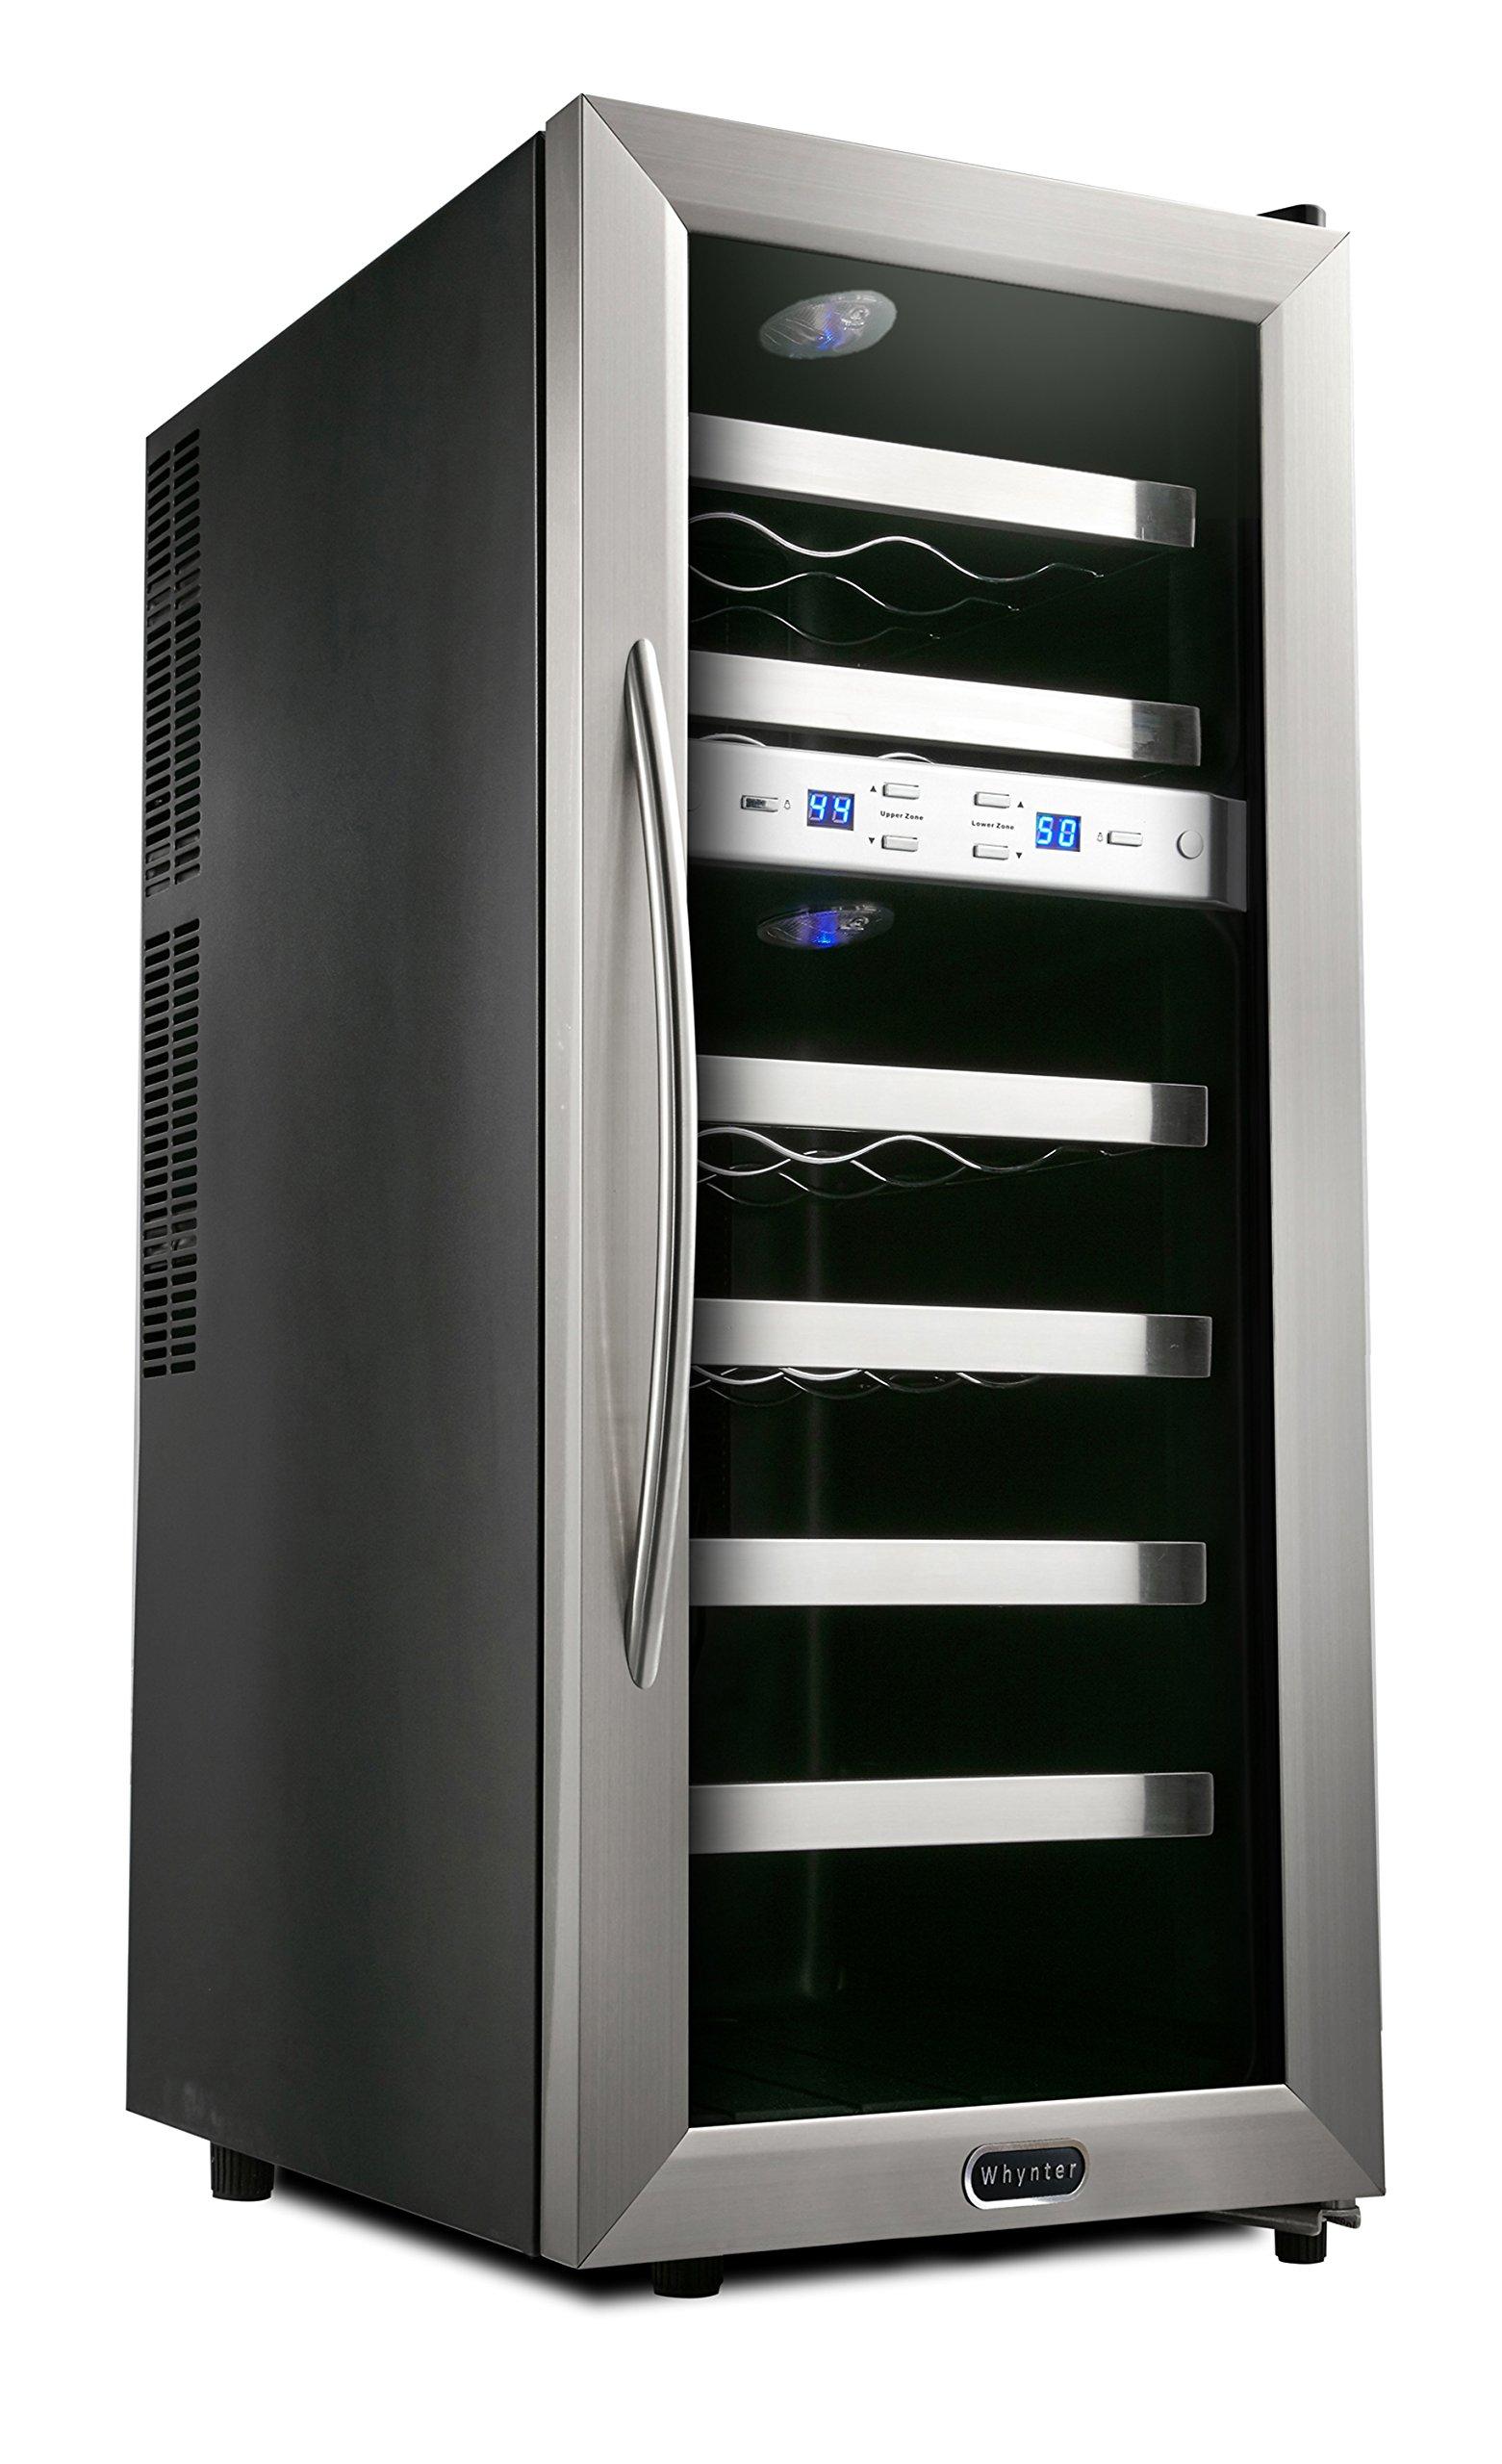 Whynter WC-211DA 21 Bottle Dual Temperature Zone Freestanding Wine Cooler, Black